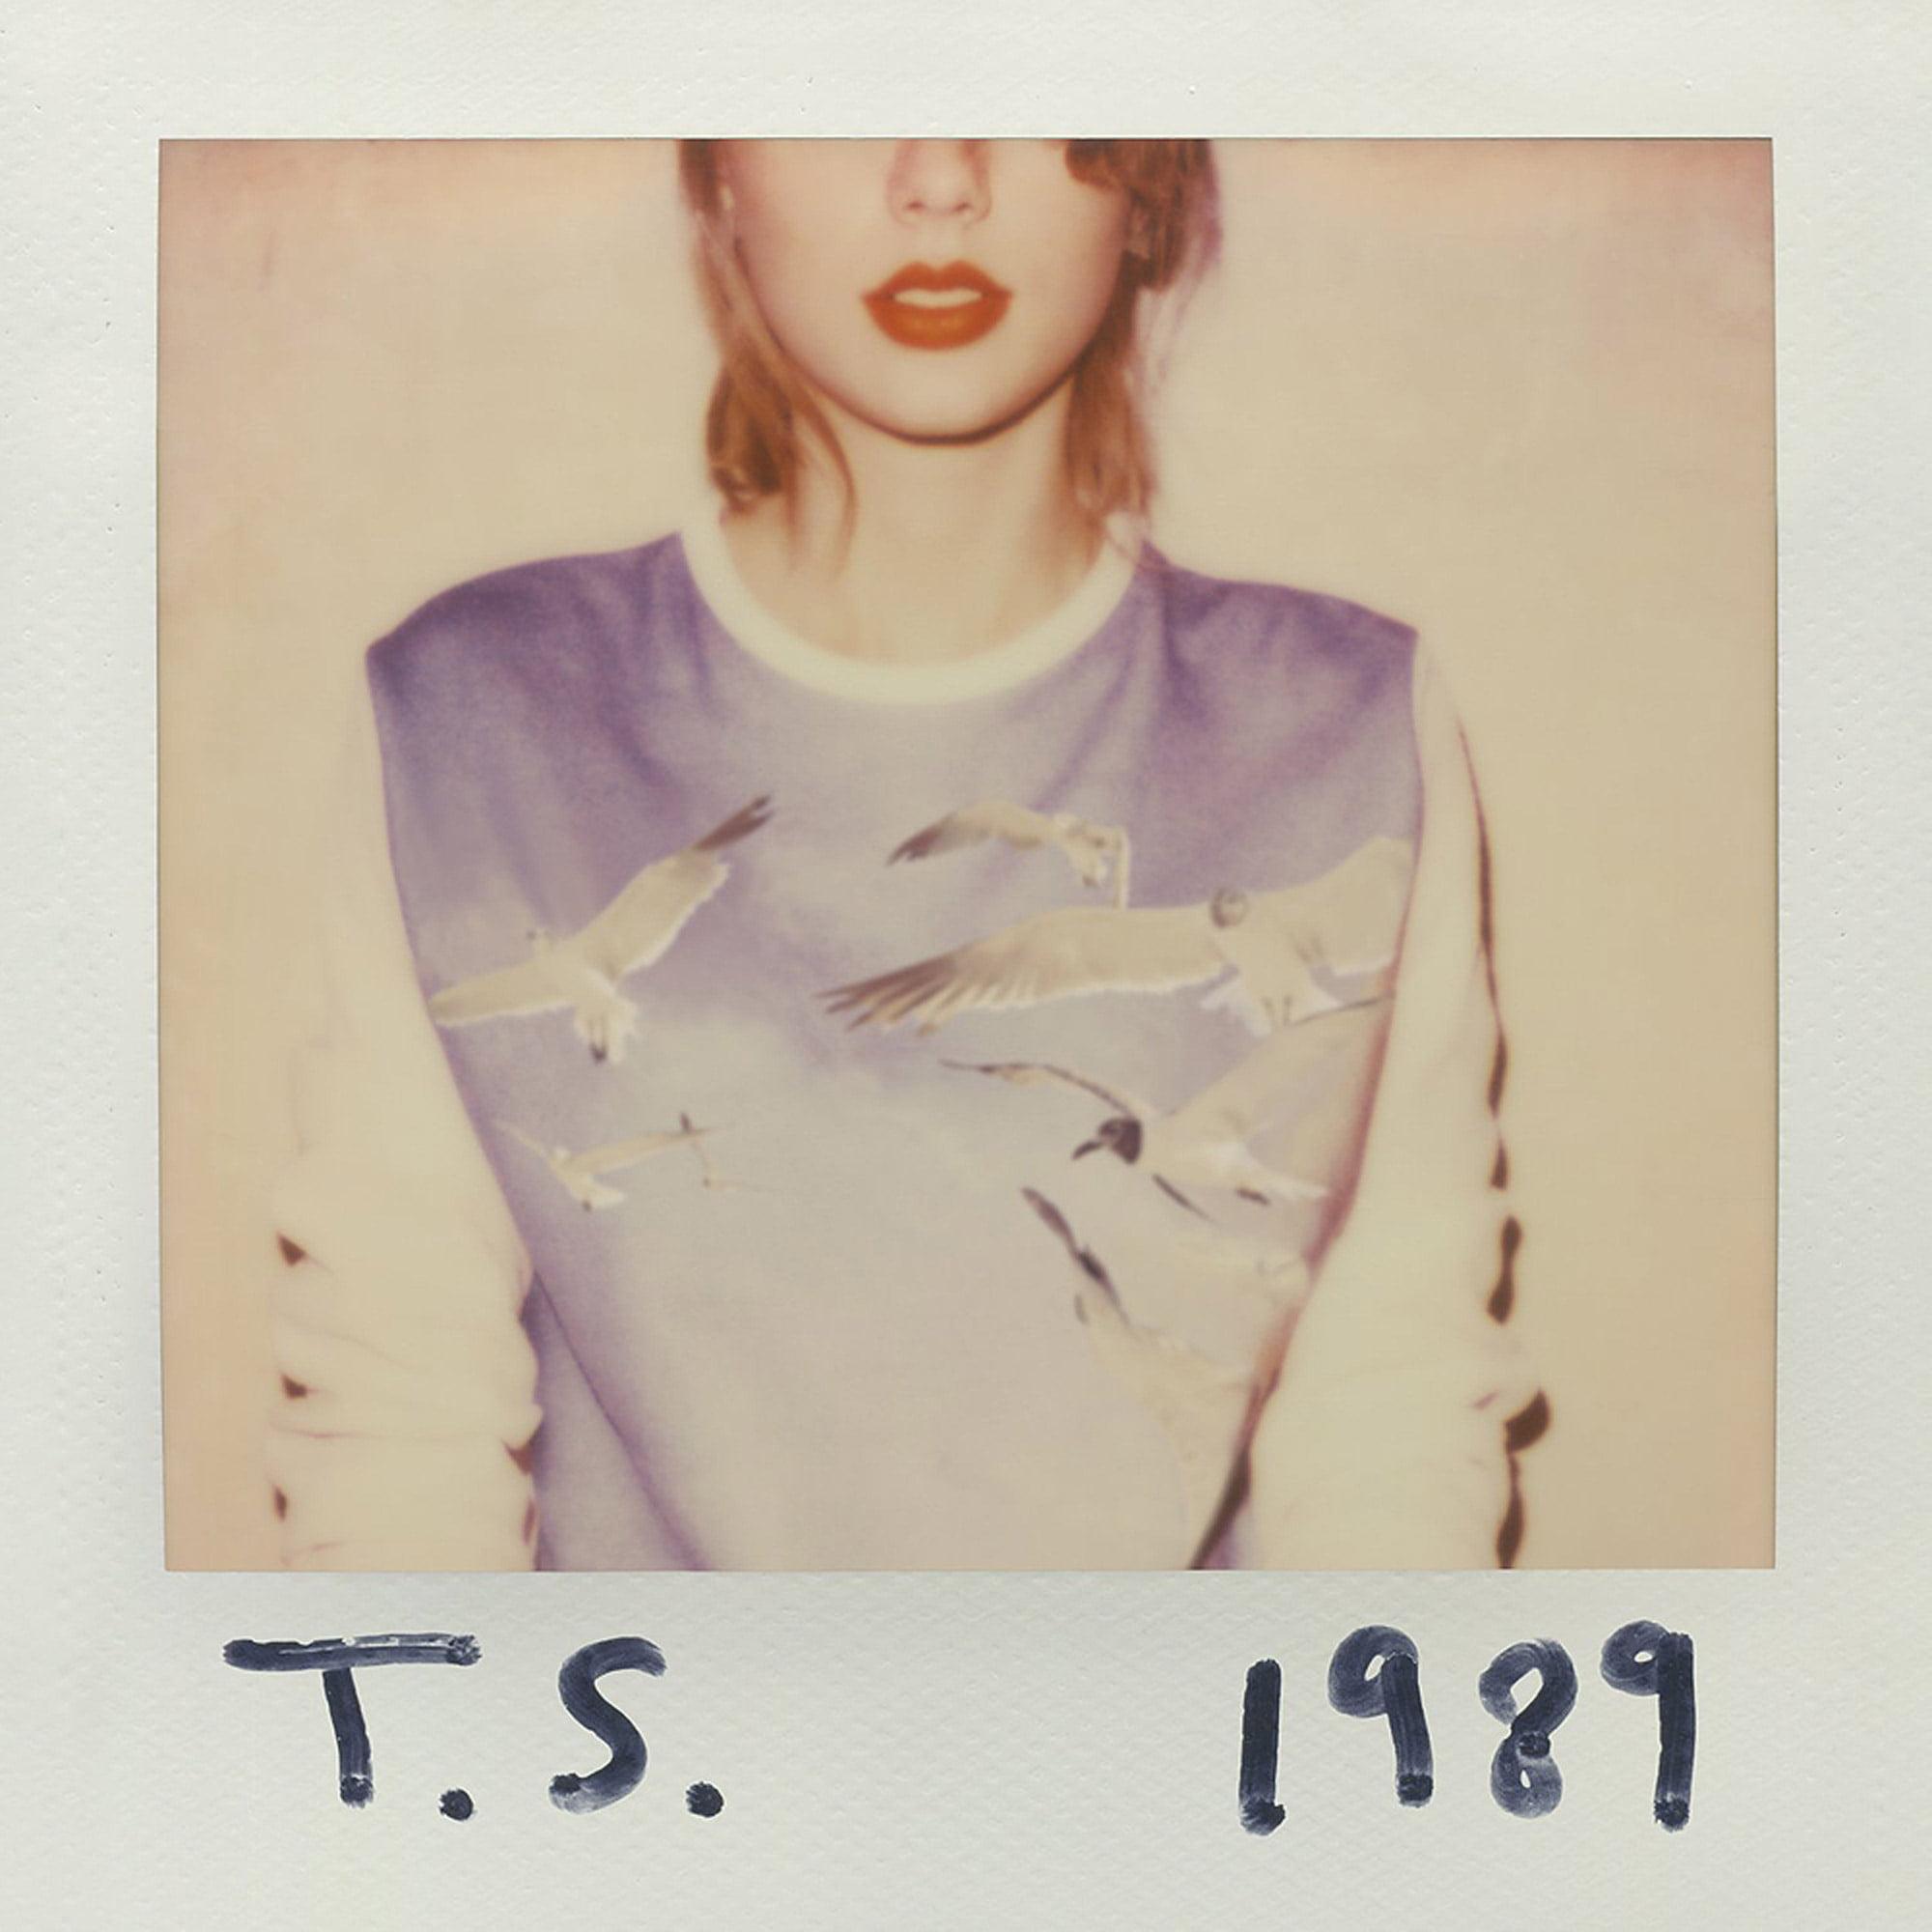 1989 (2 LP) (Vinyl)